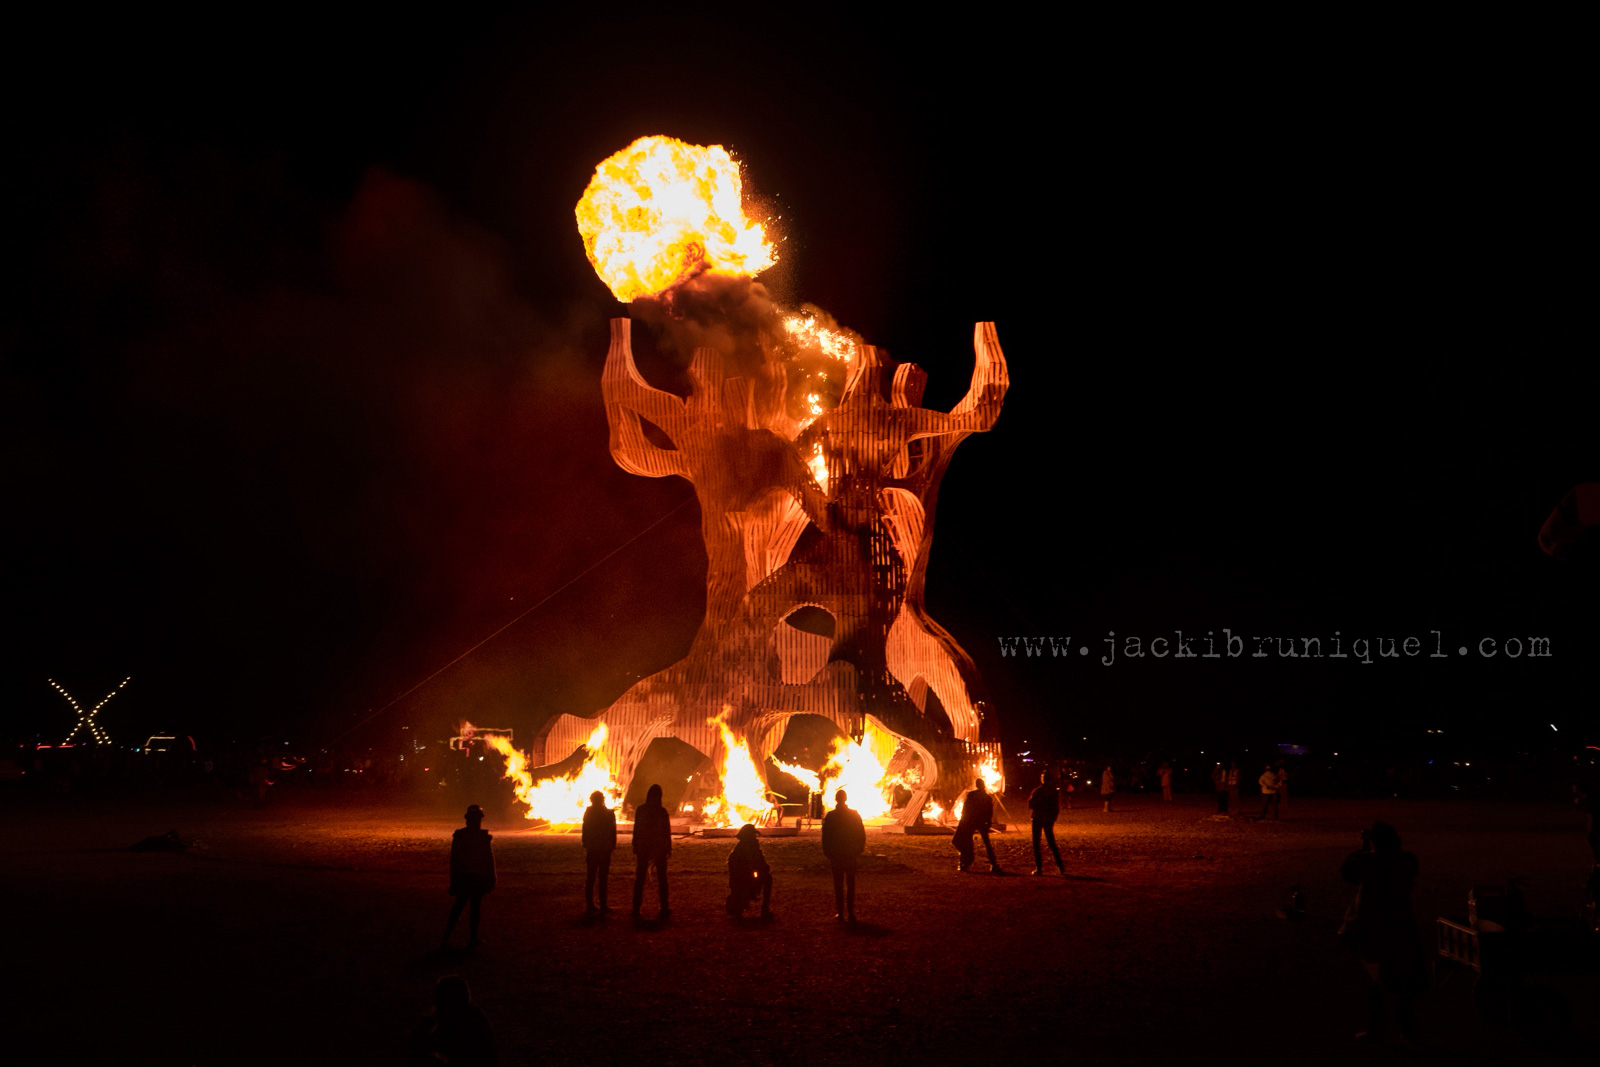 Afrika-Burn-2016-Creative-South-African-Photographer-Jacki-Bruniquel-016.jpg